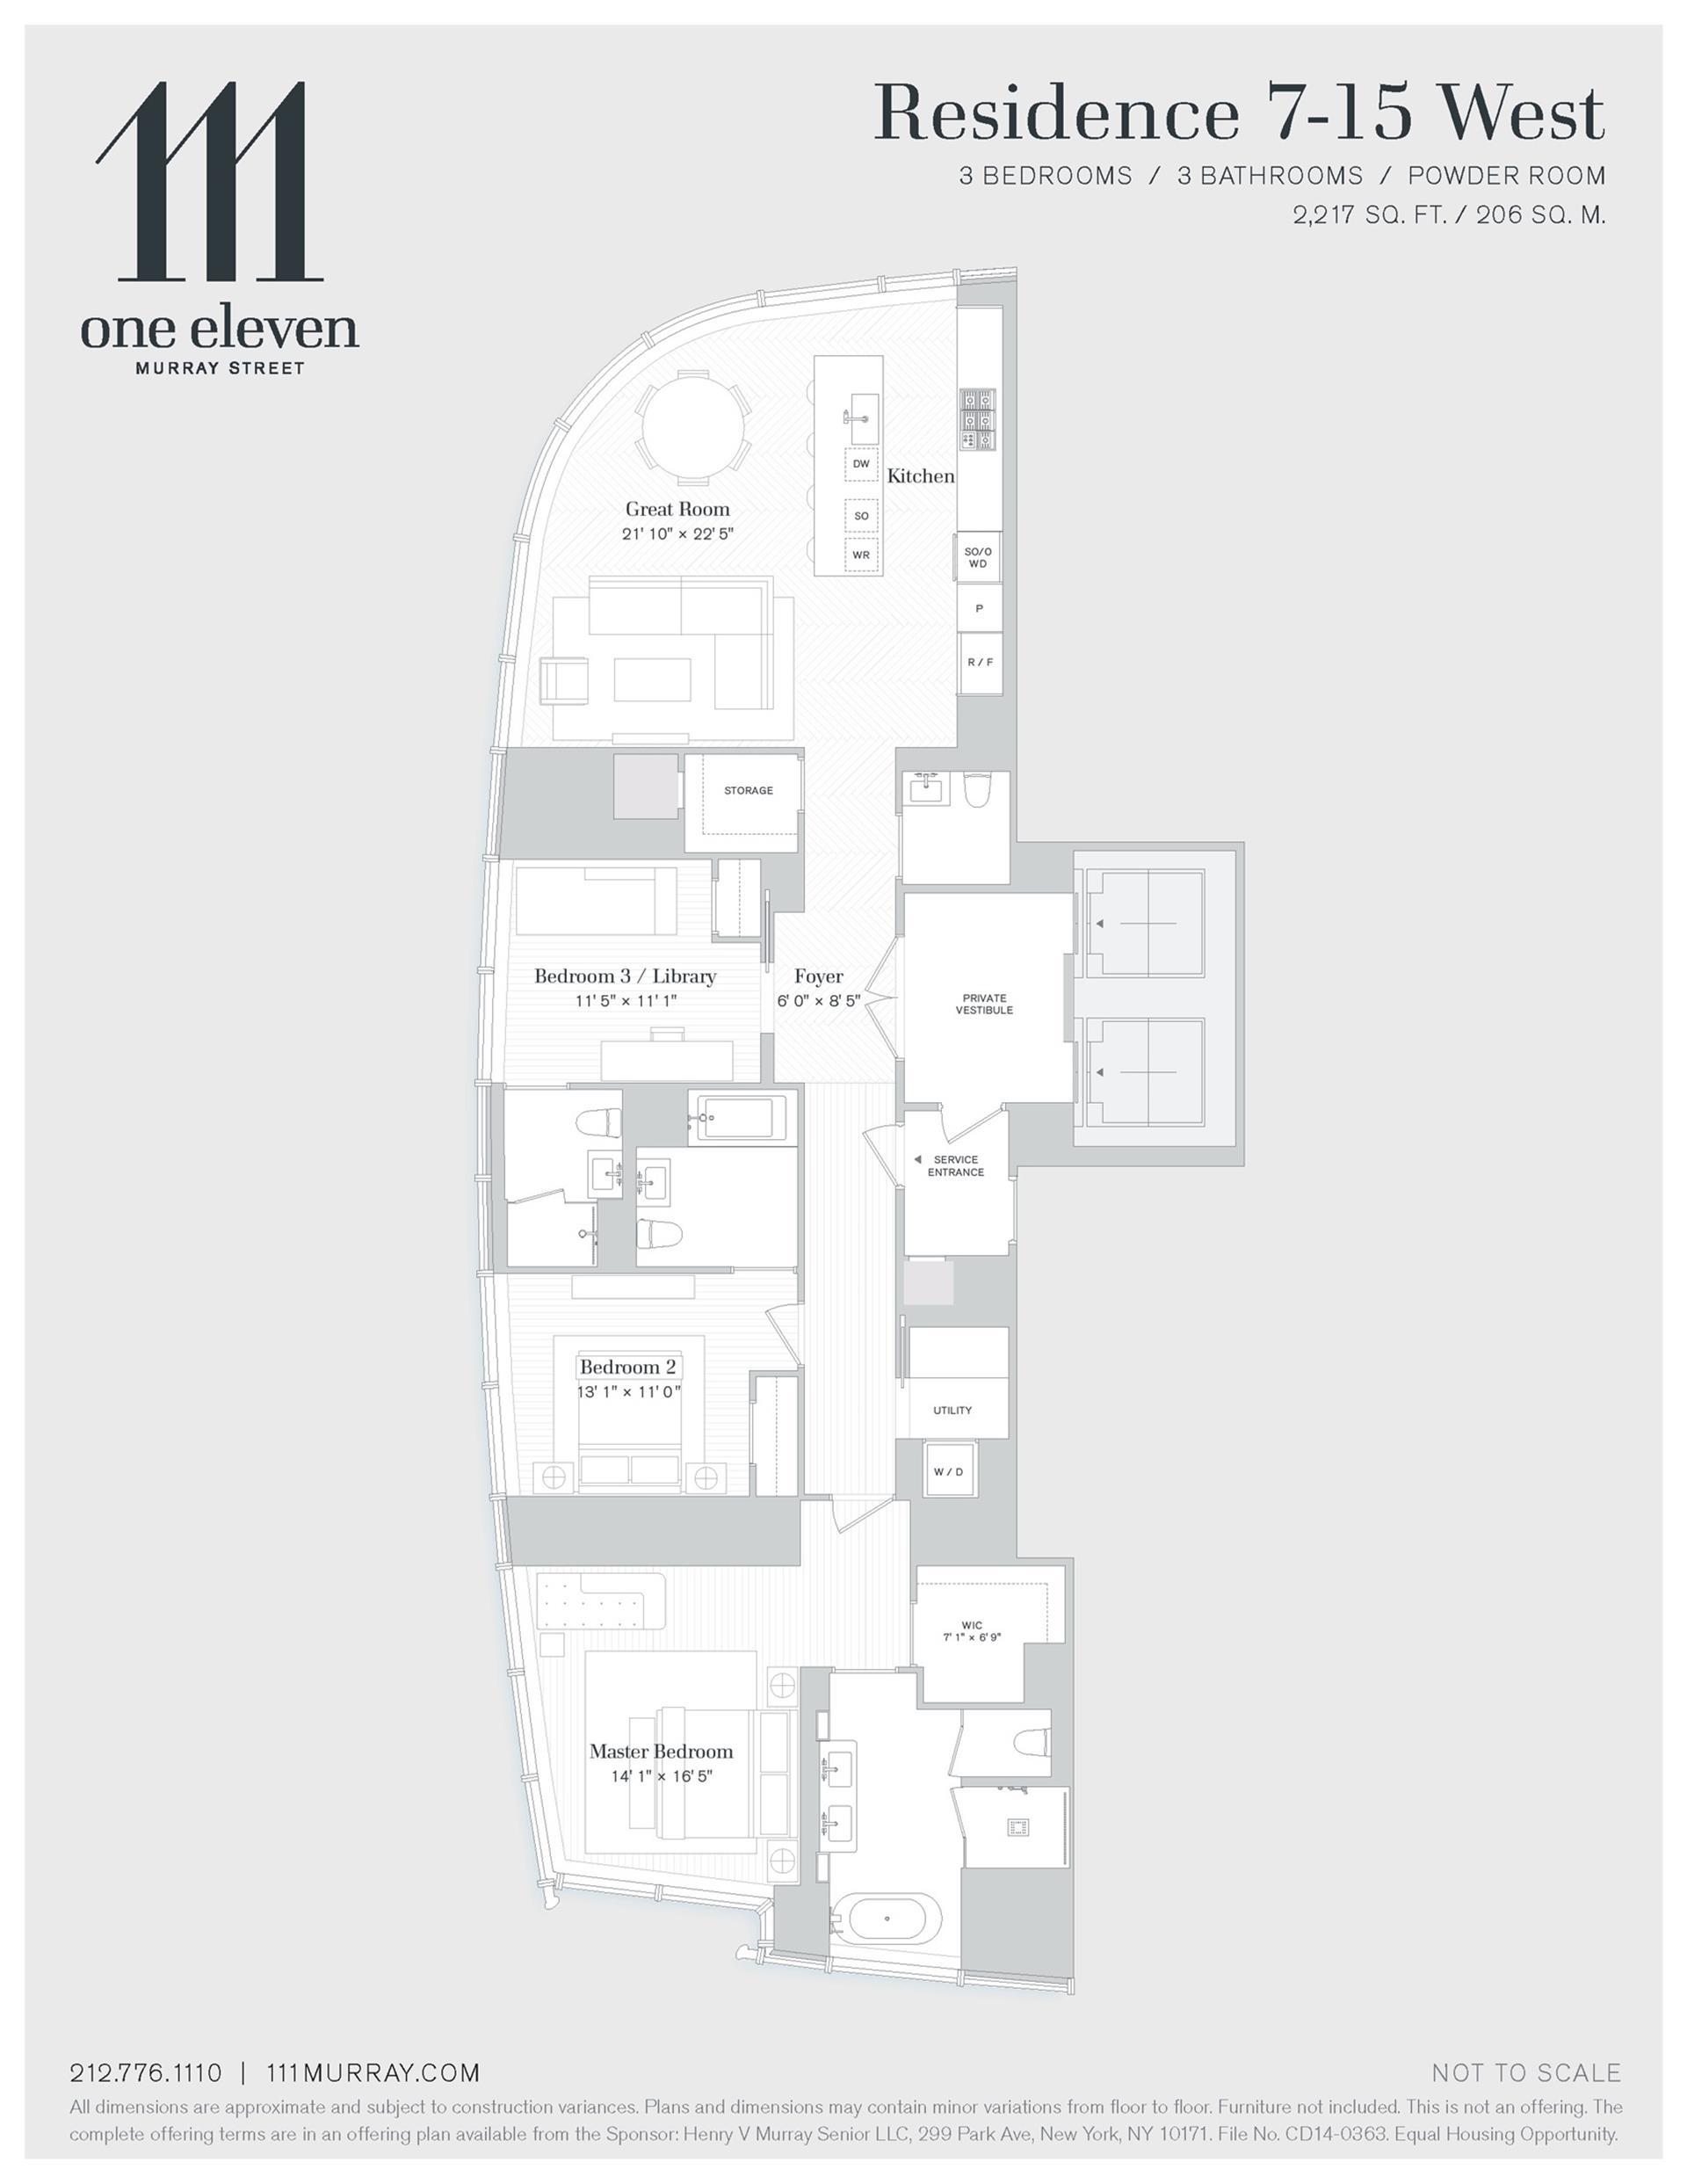 Floor plan of 111 Murray St, 8WEST - TriBeCa, New York